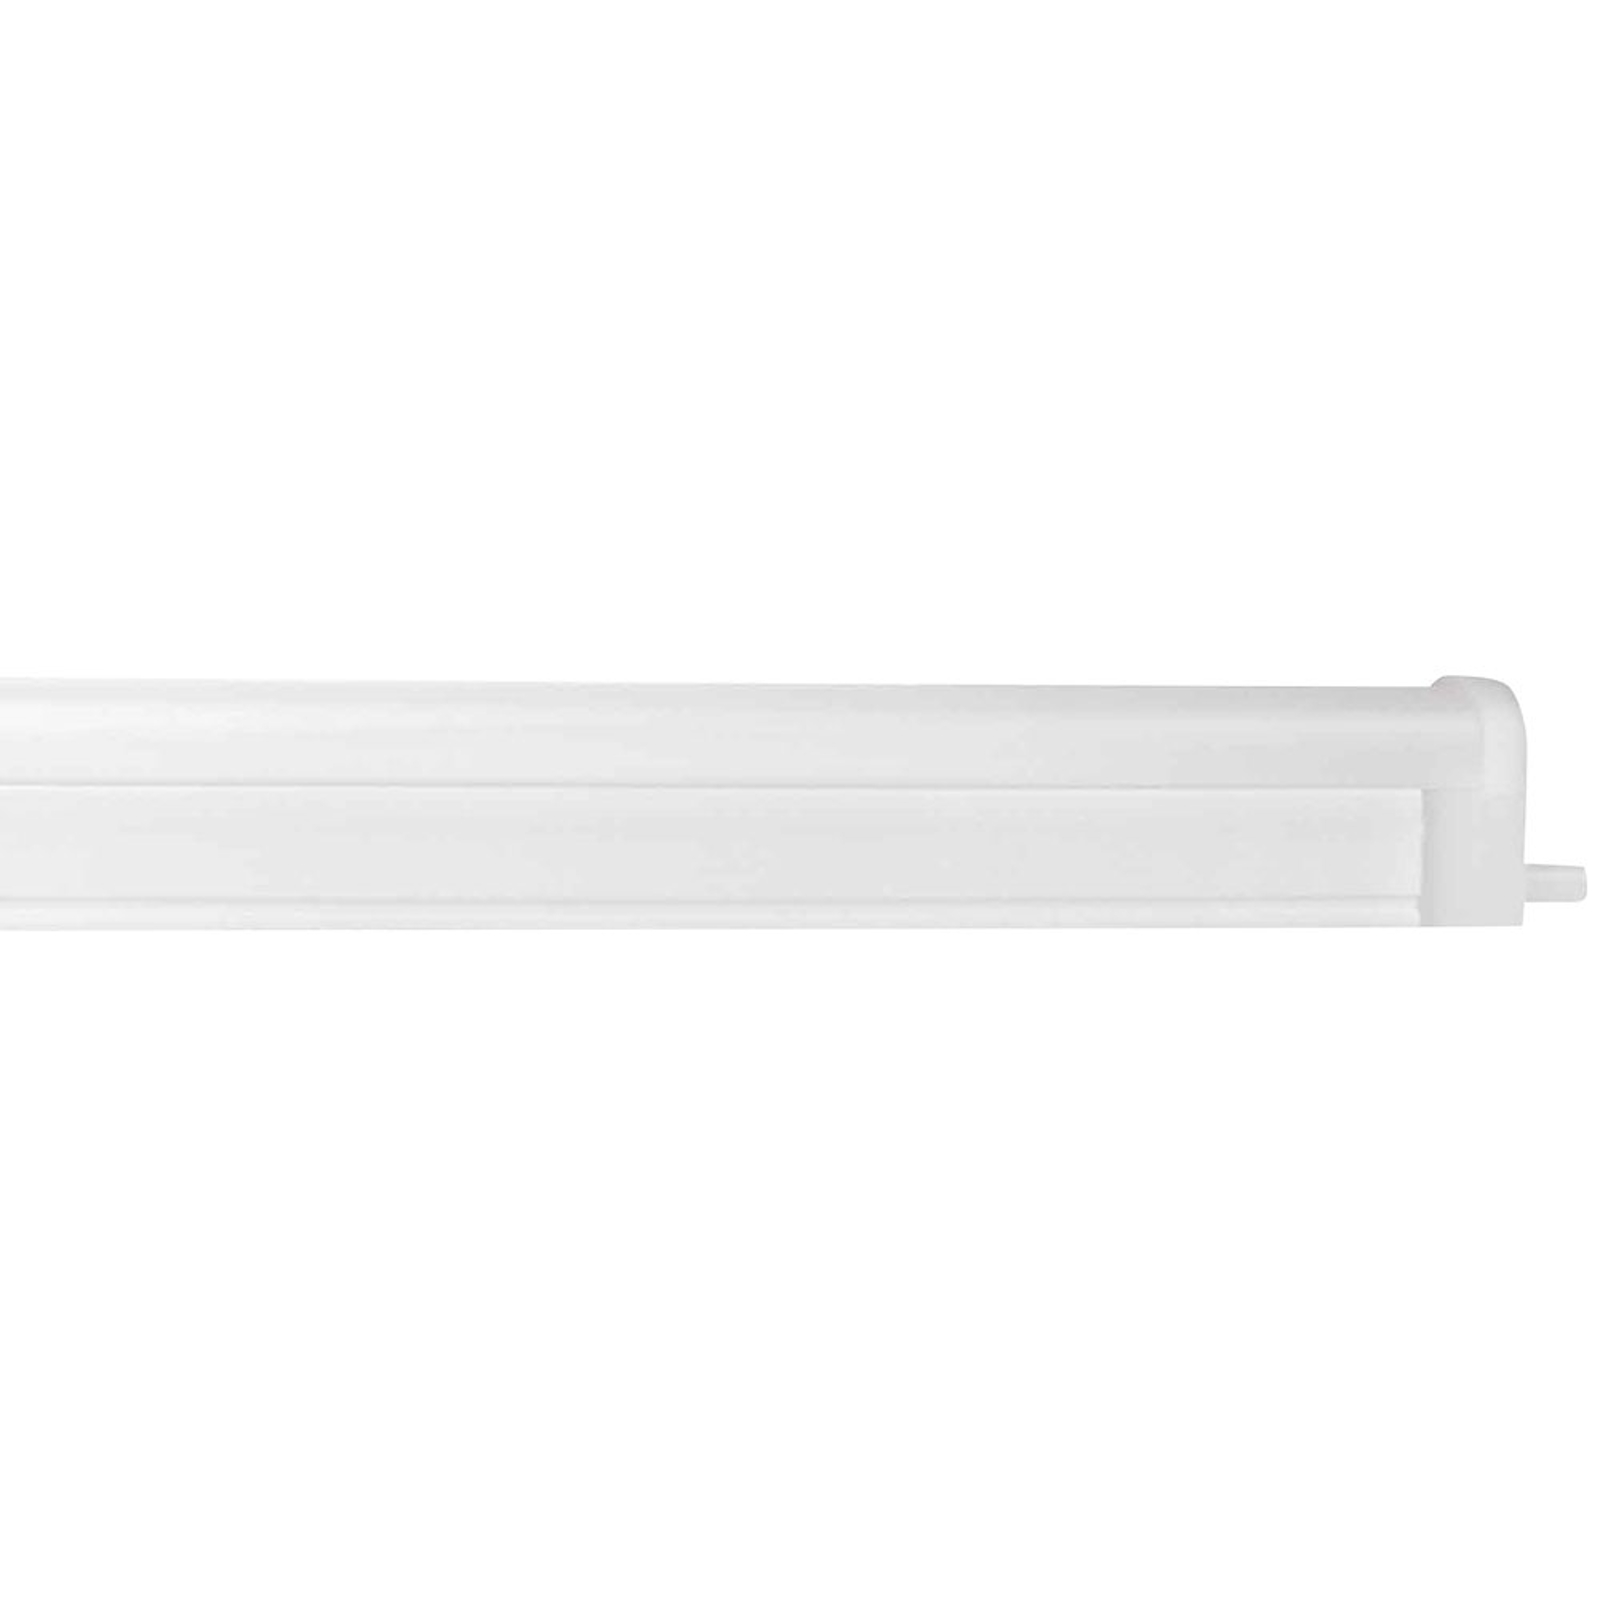 Megaman Pinolite LED-plantelampe, 28 cm, 4 W